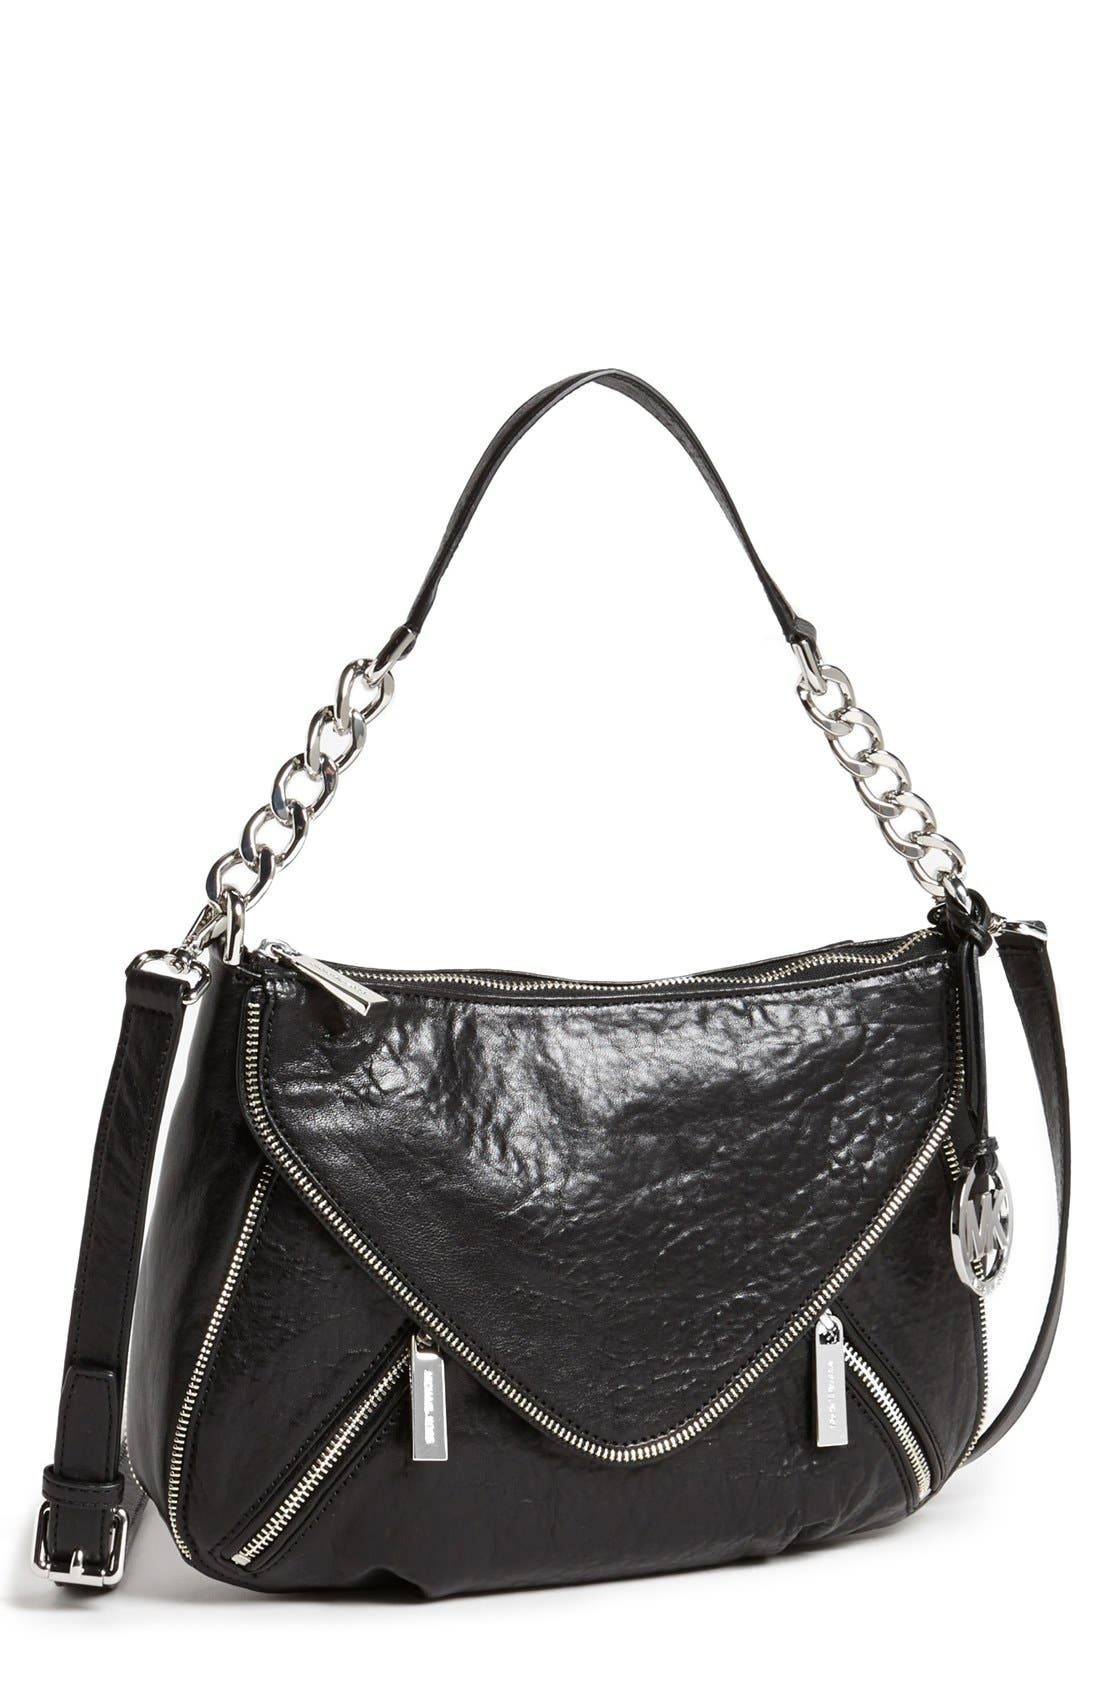 Main Image - MICHAEL Michael Kors 'Odette - Medium' Leather Crossbody Bag